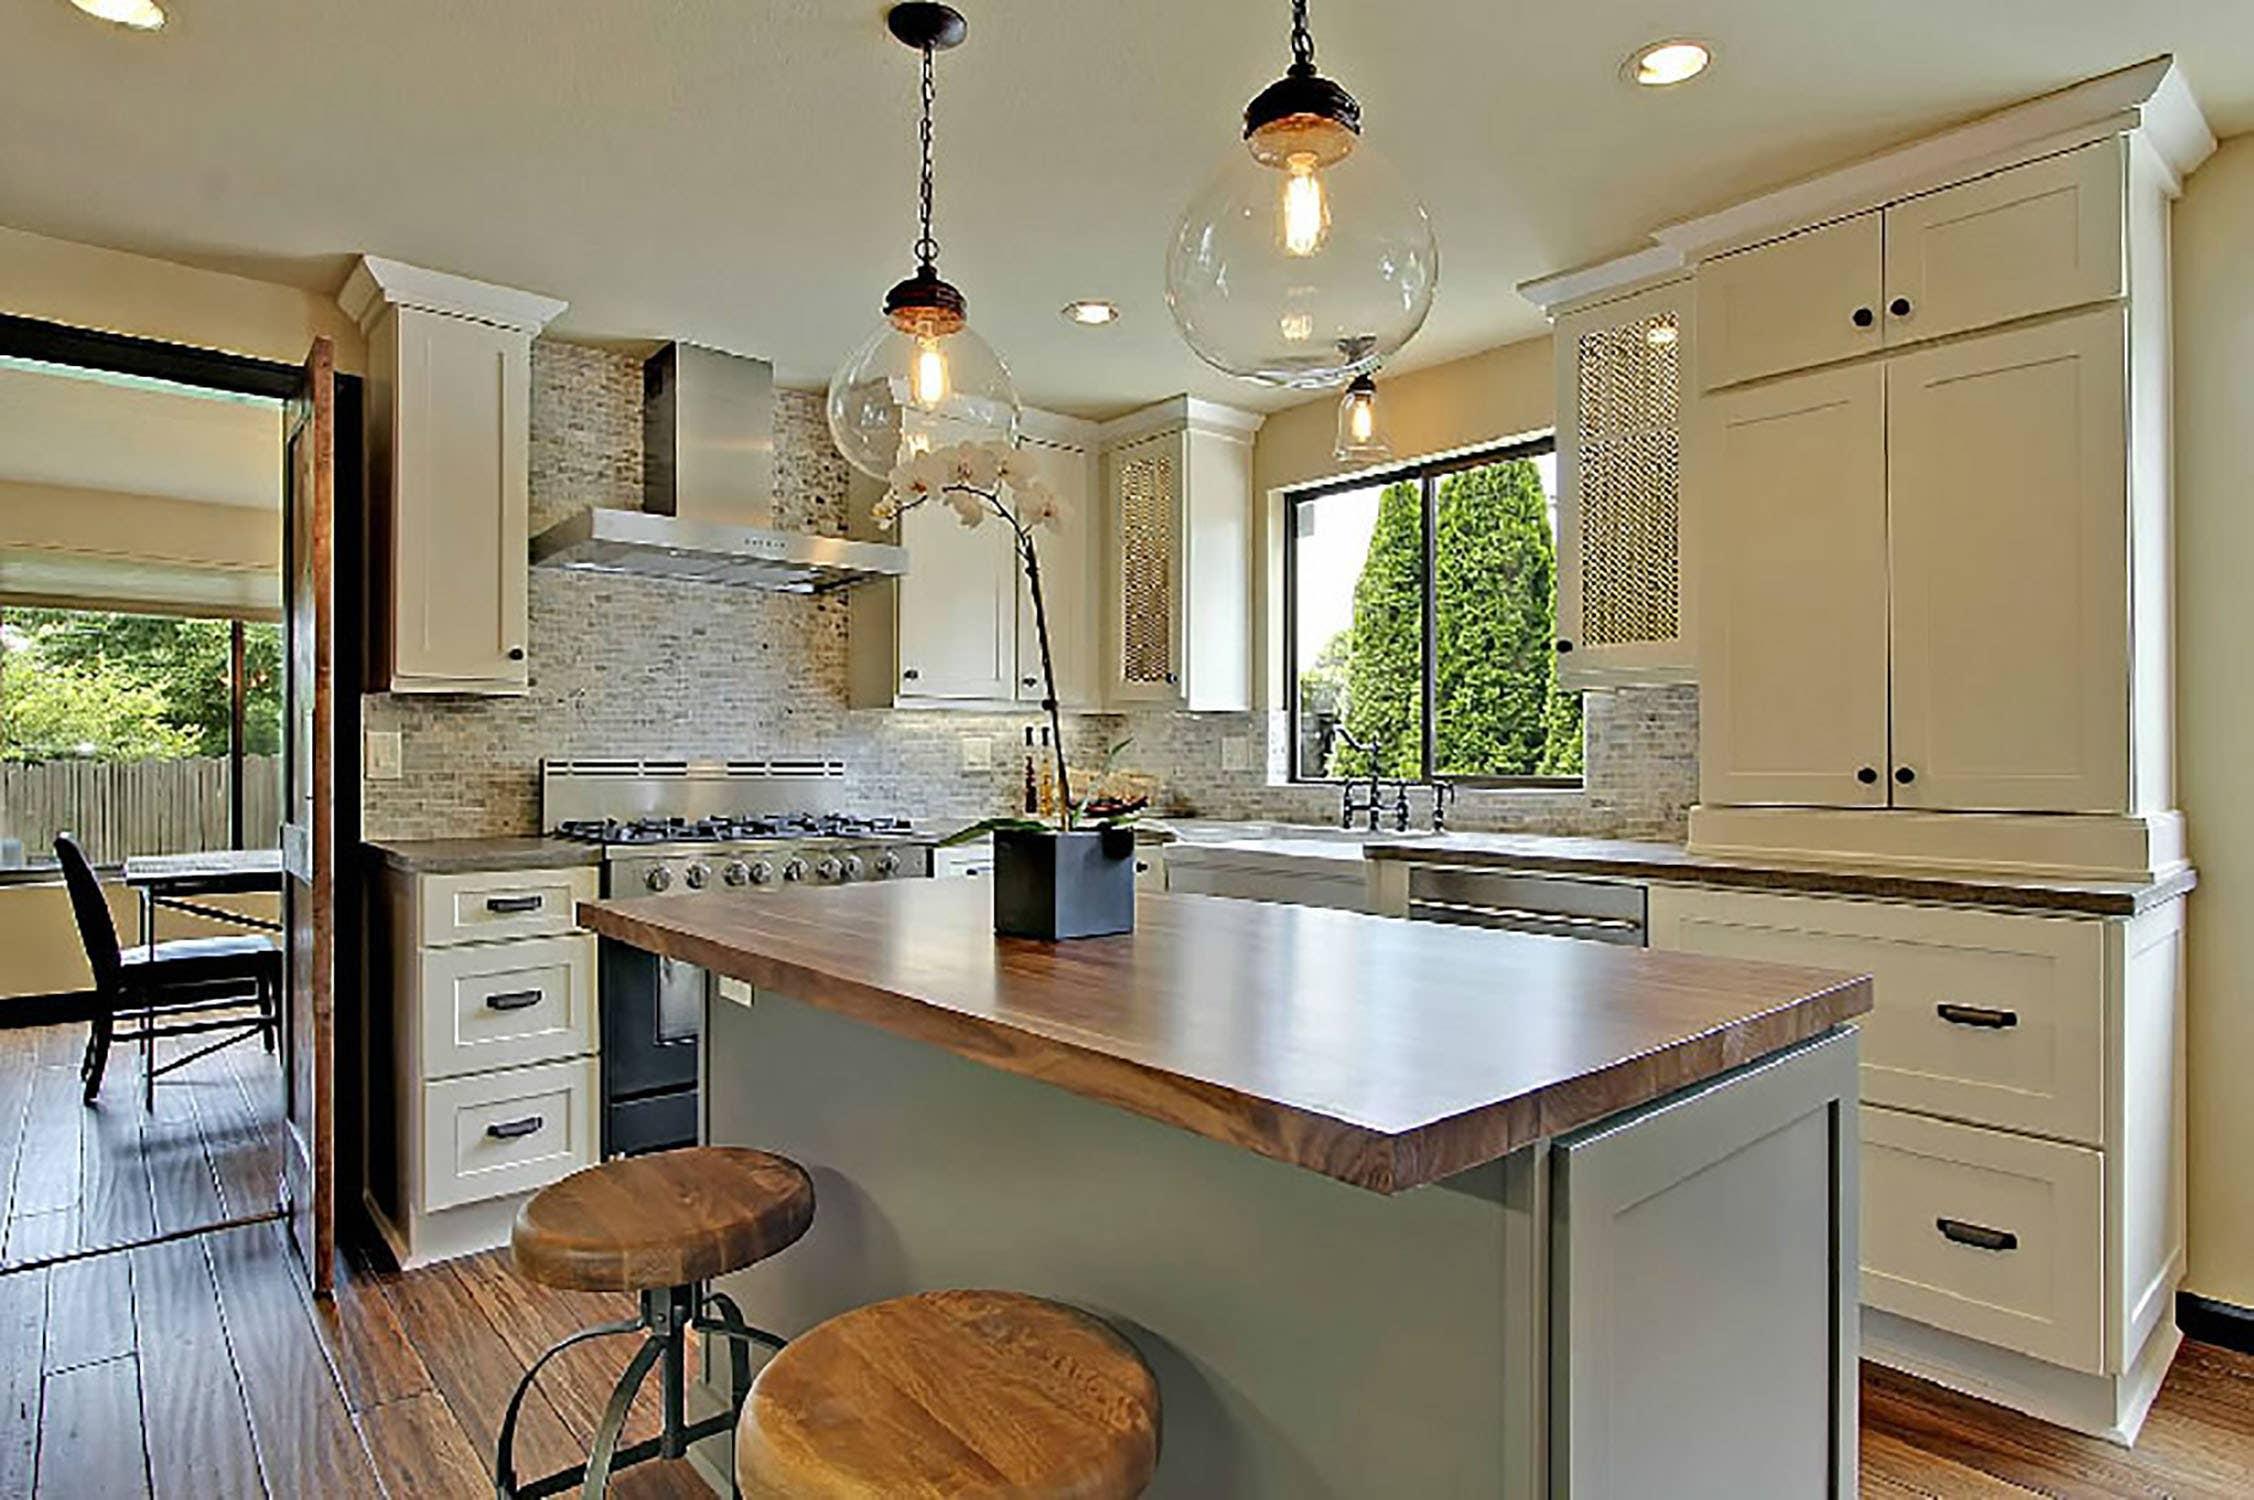 kitchen has white shaker cabinets, wood countertops, bar stools and floor, and natural stone backsplash